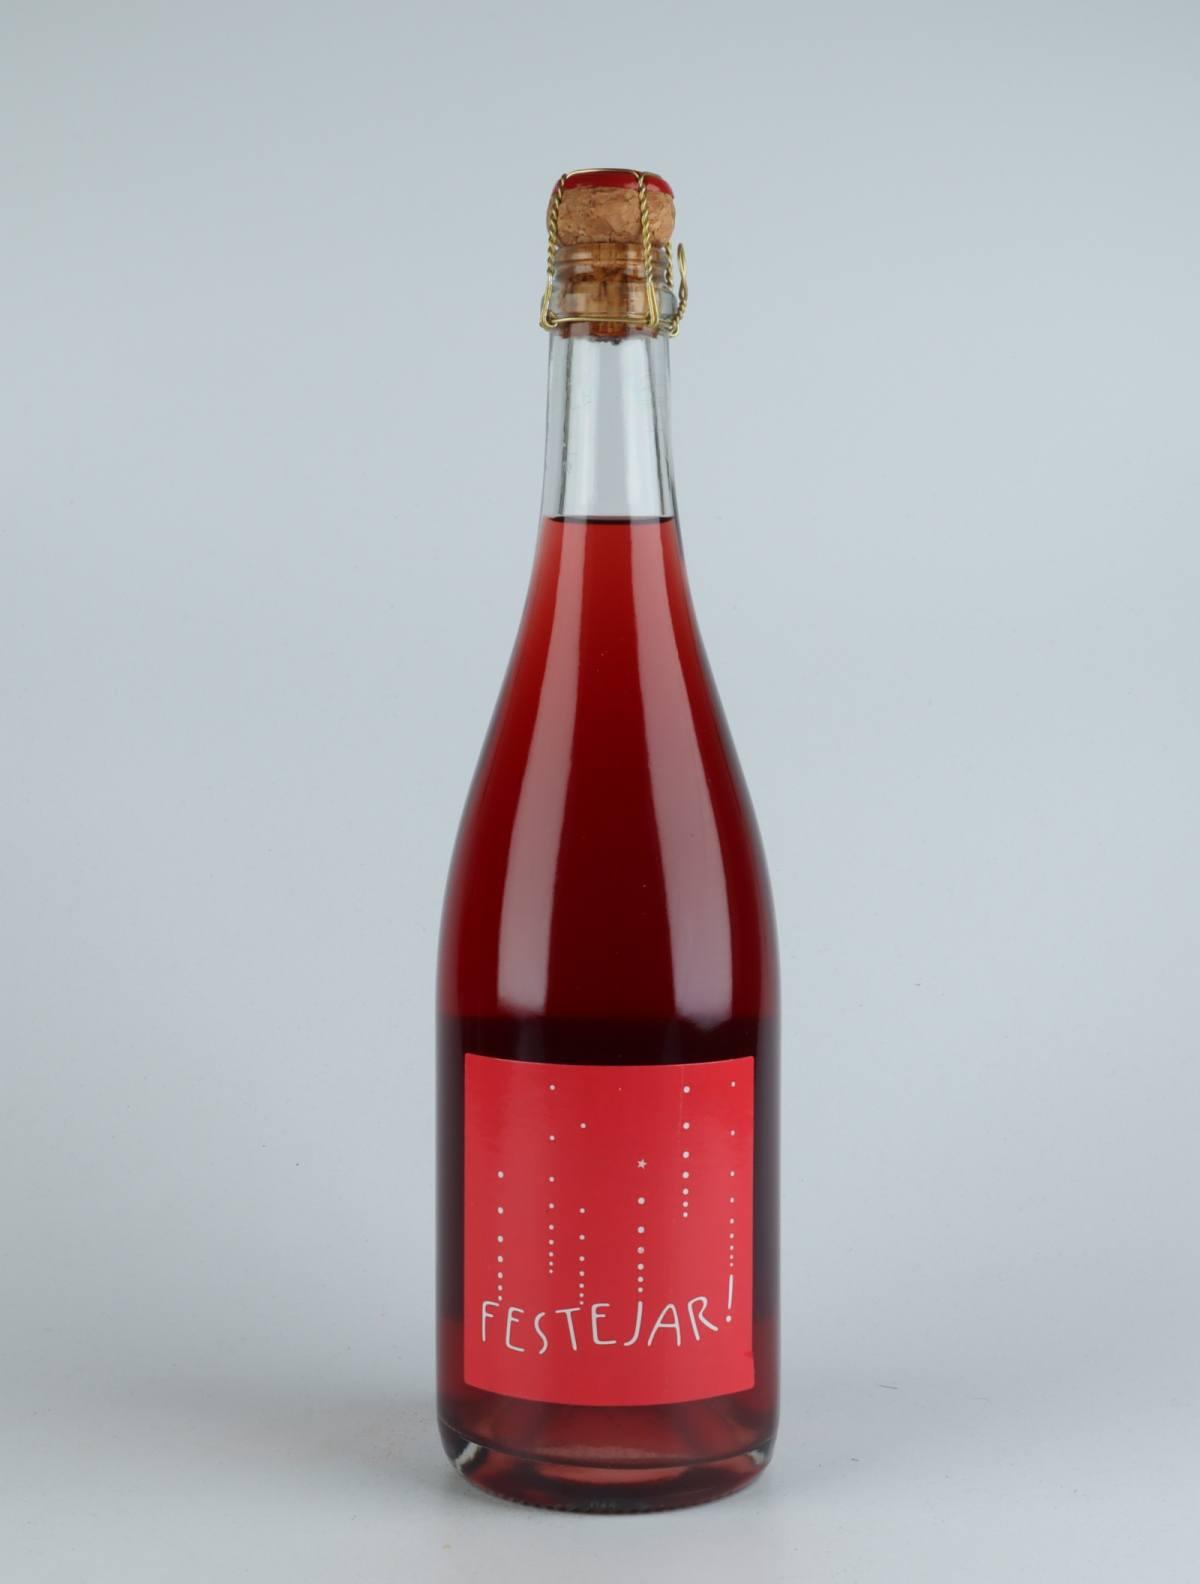 Festejar Rosé